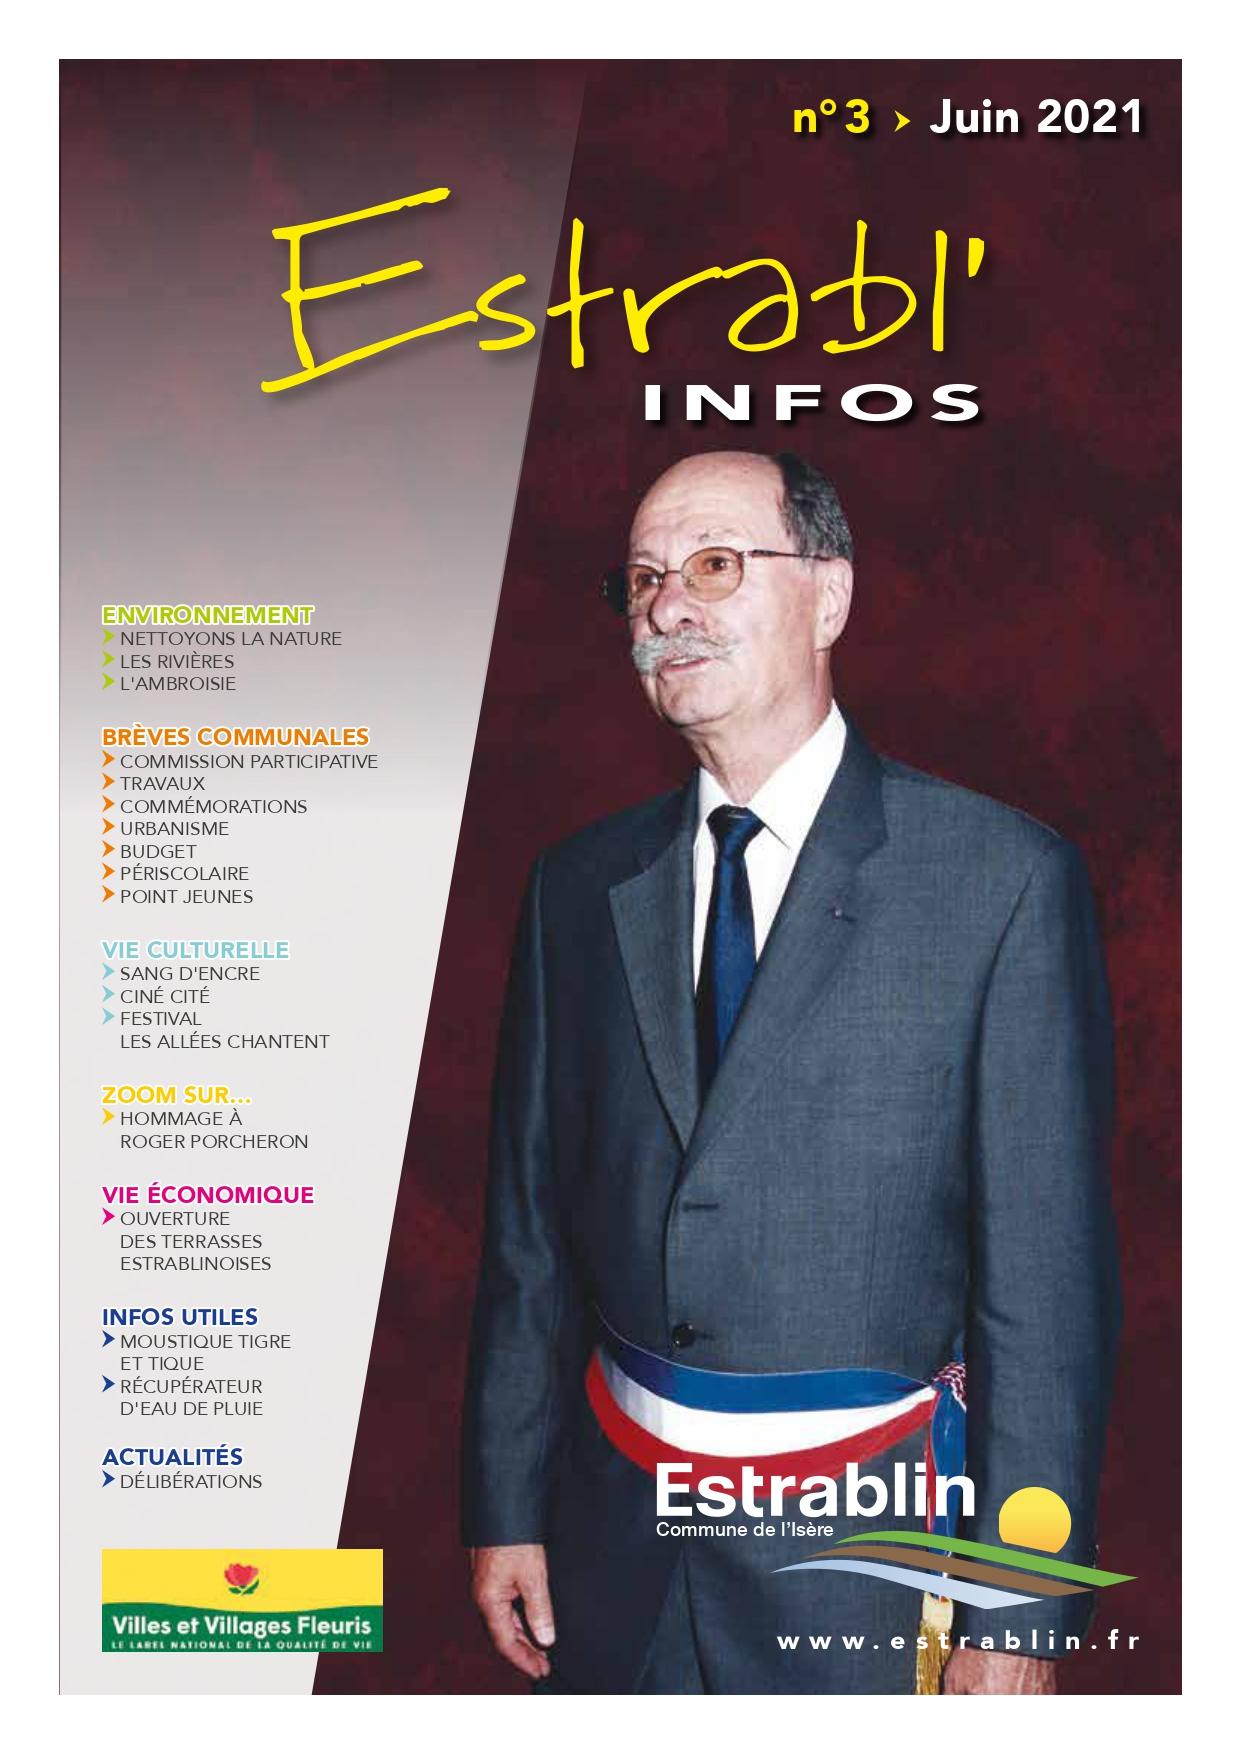 estrablin_bulletin_web-1_page-0001.jpg